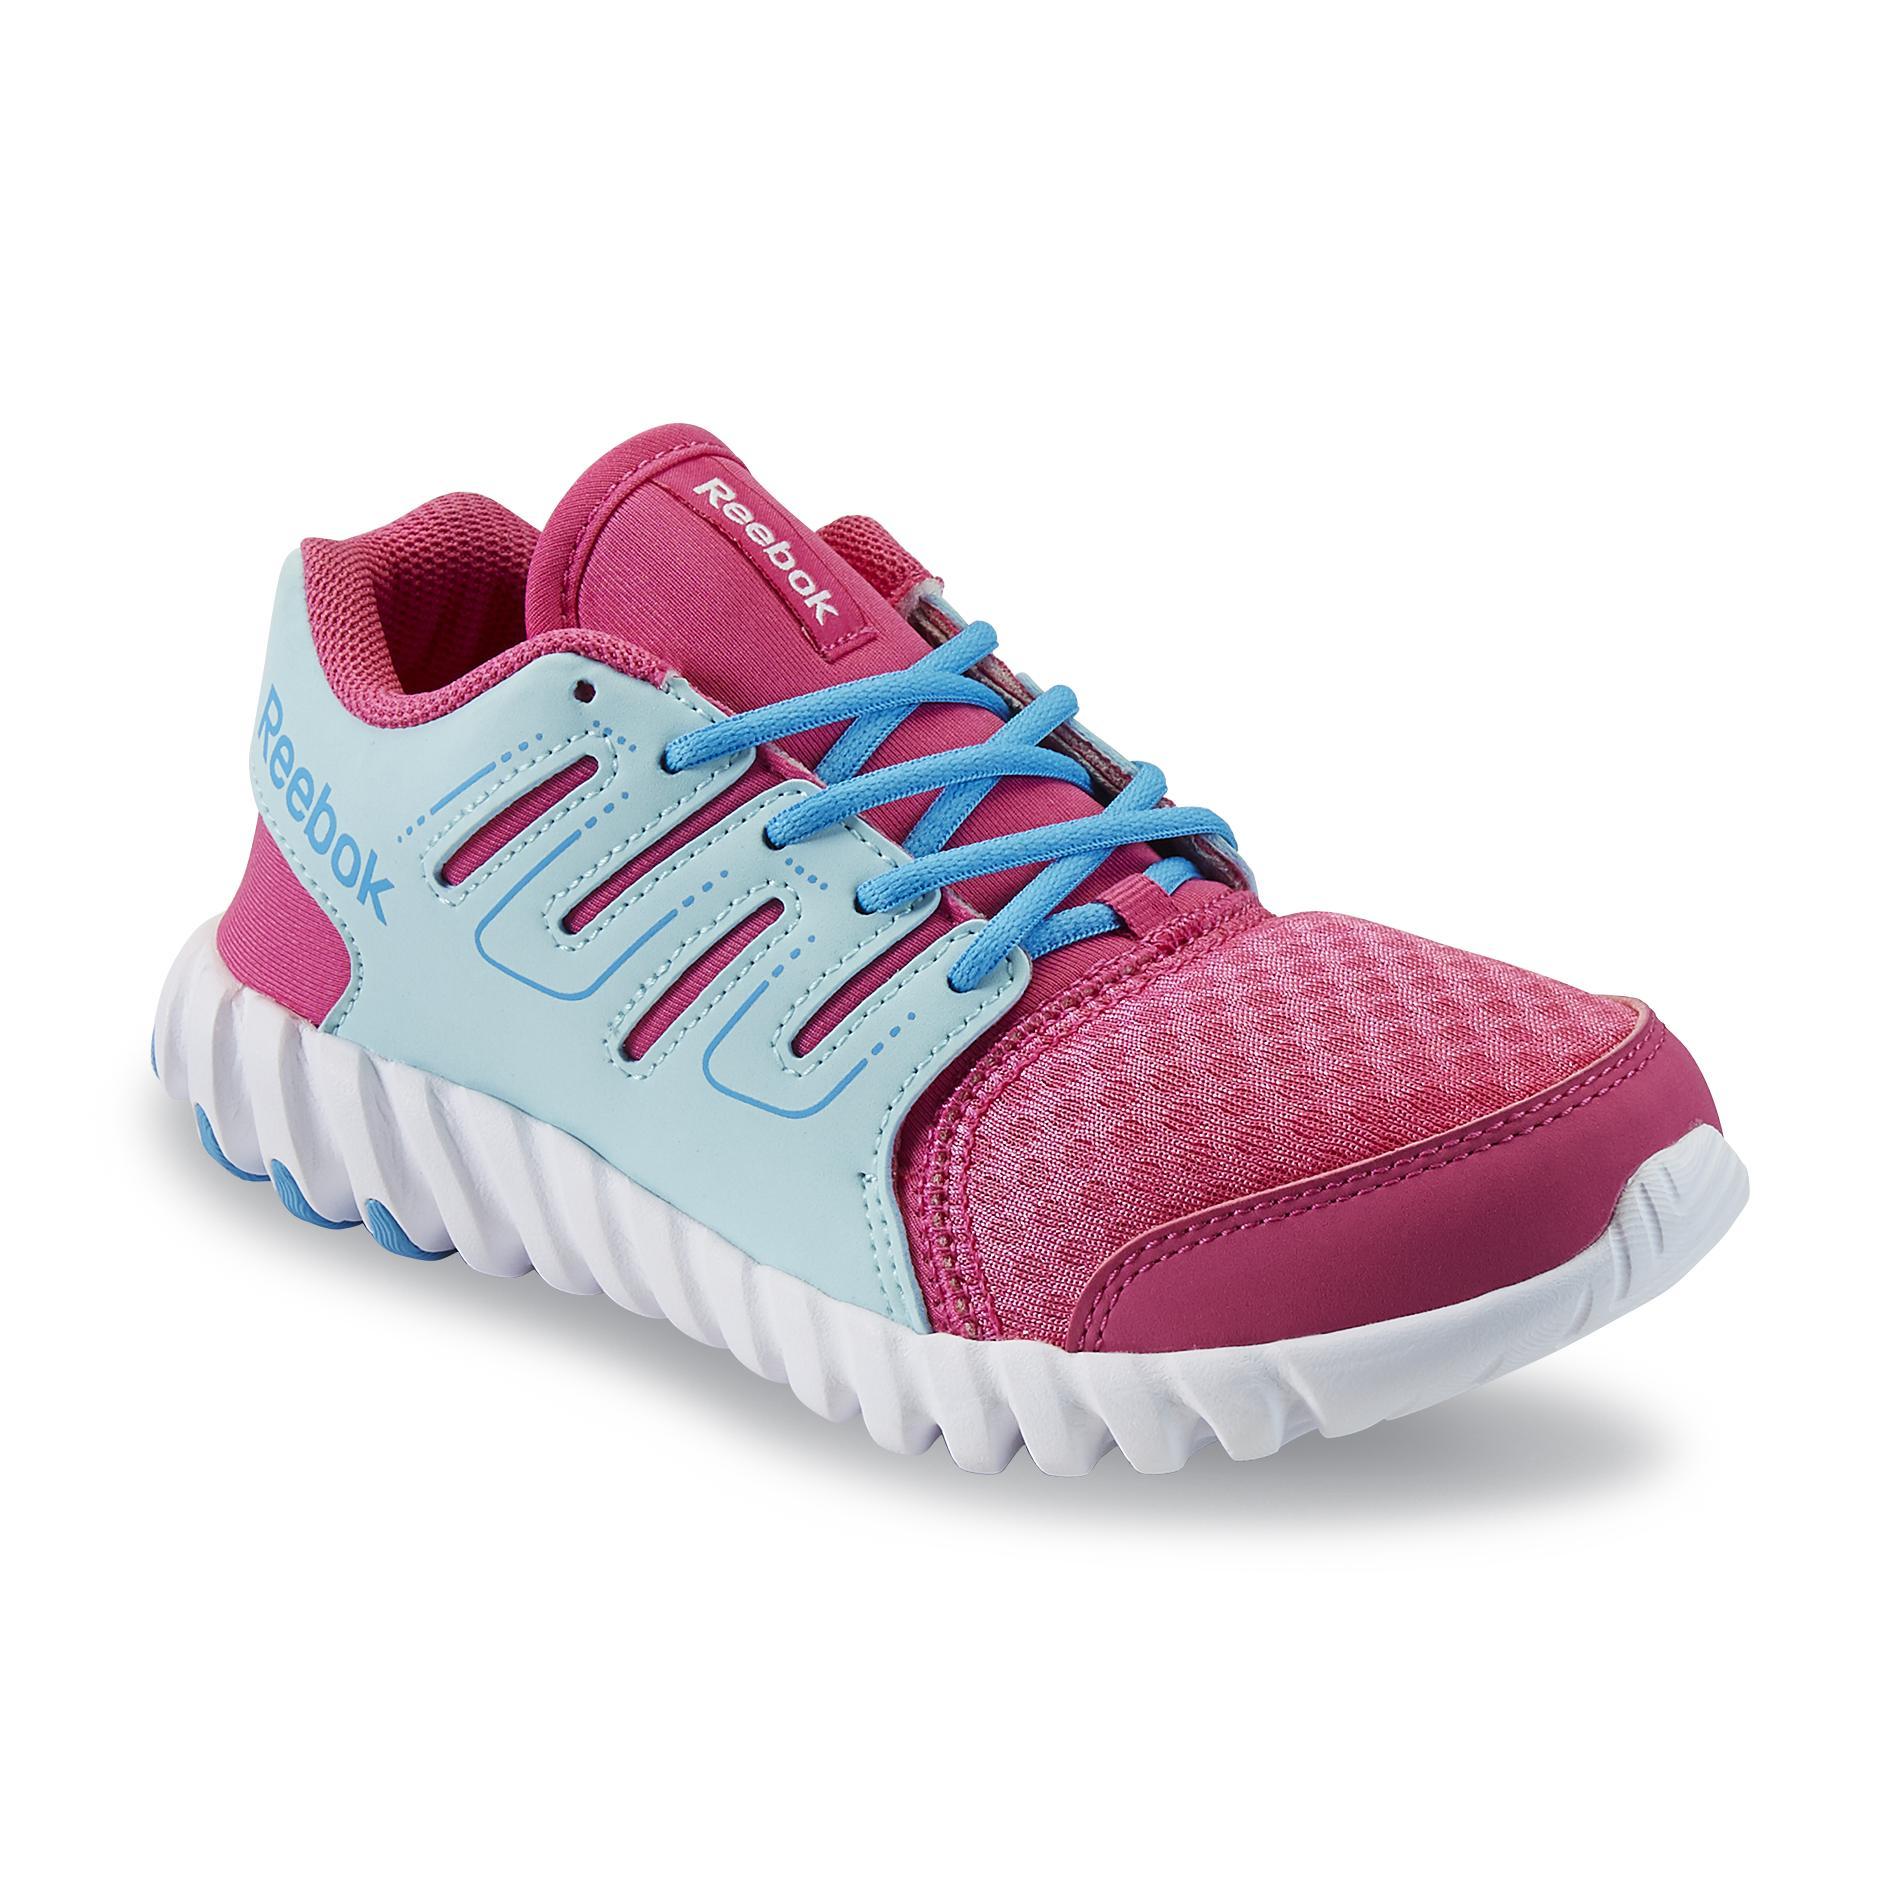 reebok s twistform pink running shoe shop your way